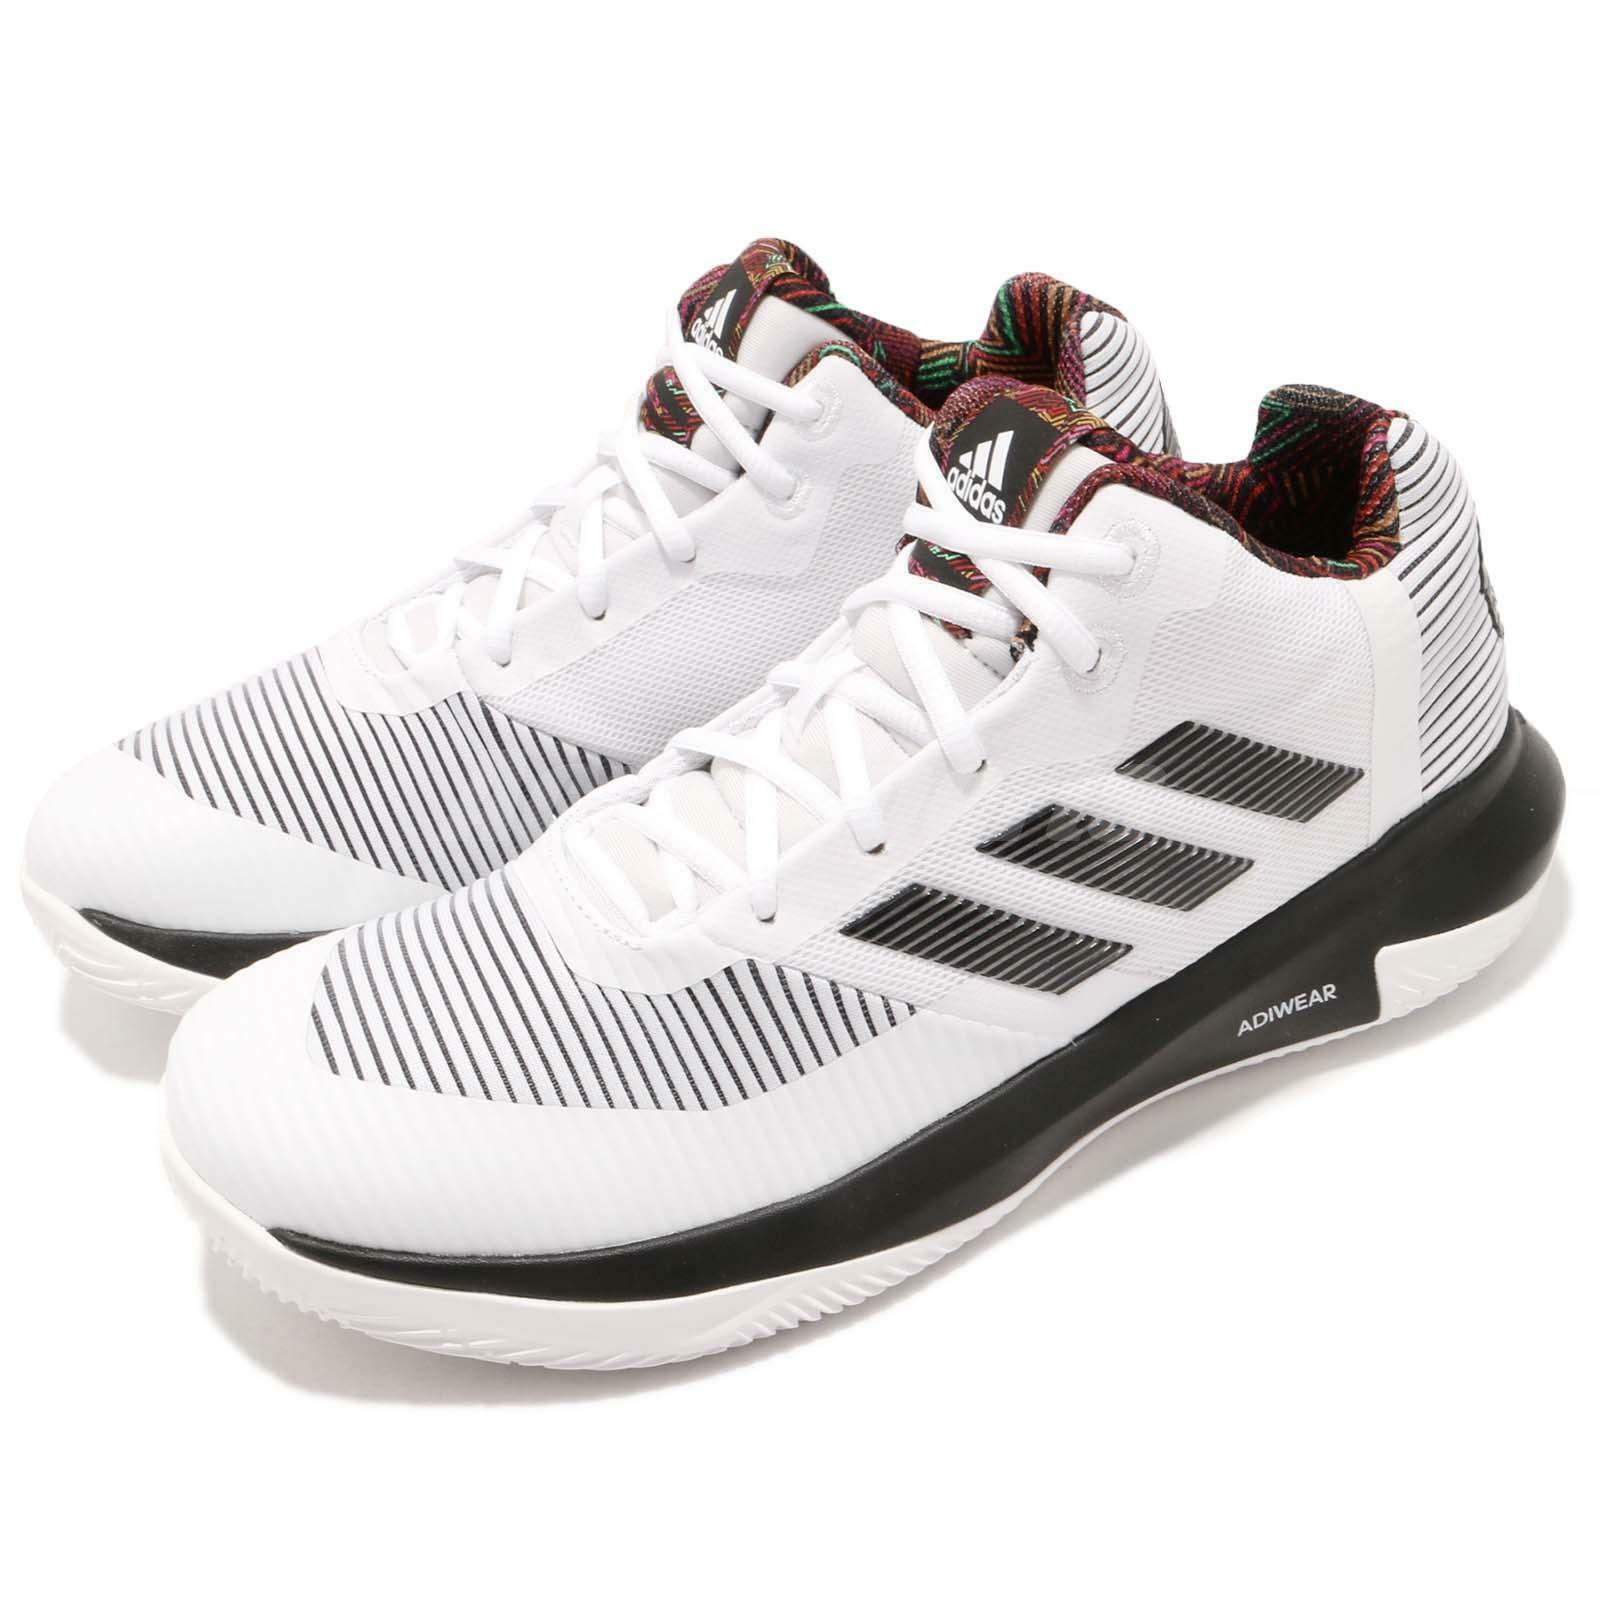 Adidas D D D rosa Lethality Derrick Summer Pack bianca nero Uomo scarpe scarpe da ginnastica BB7158 dce6cb